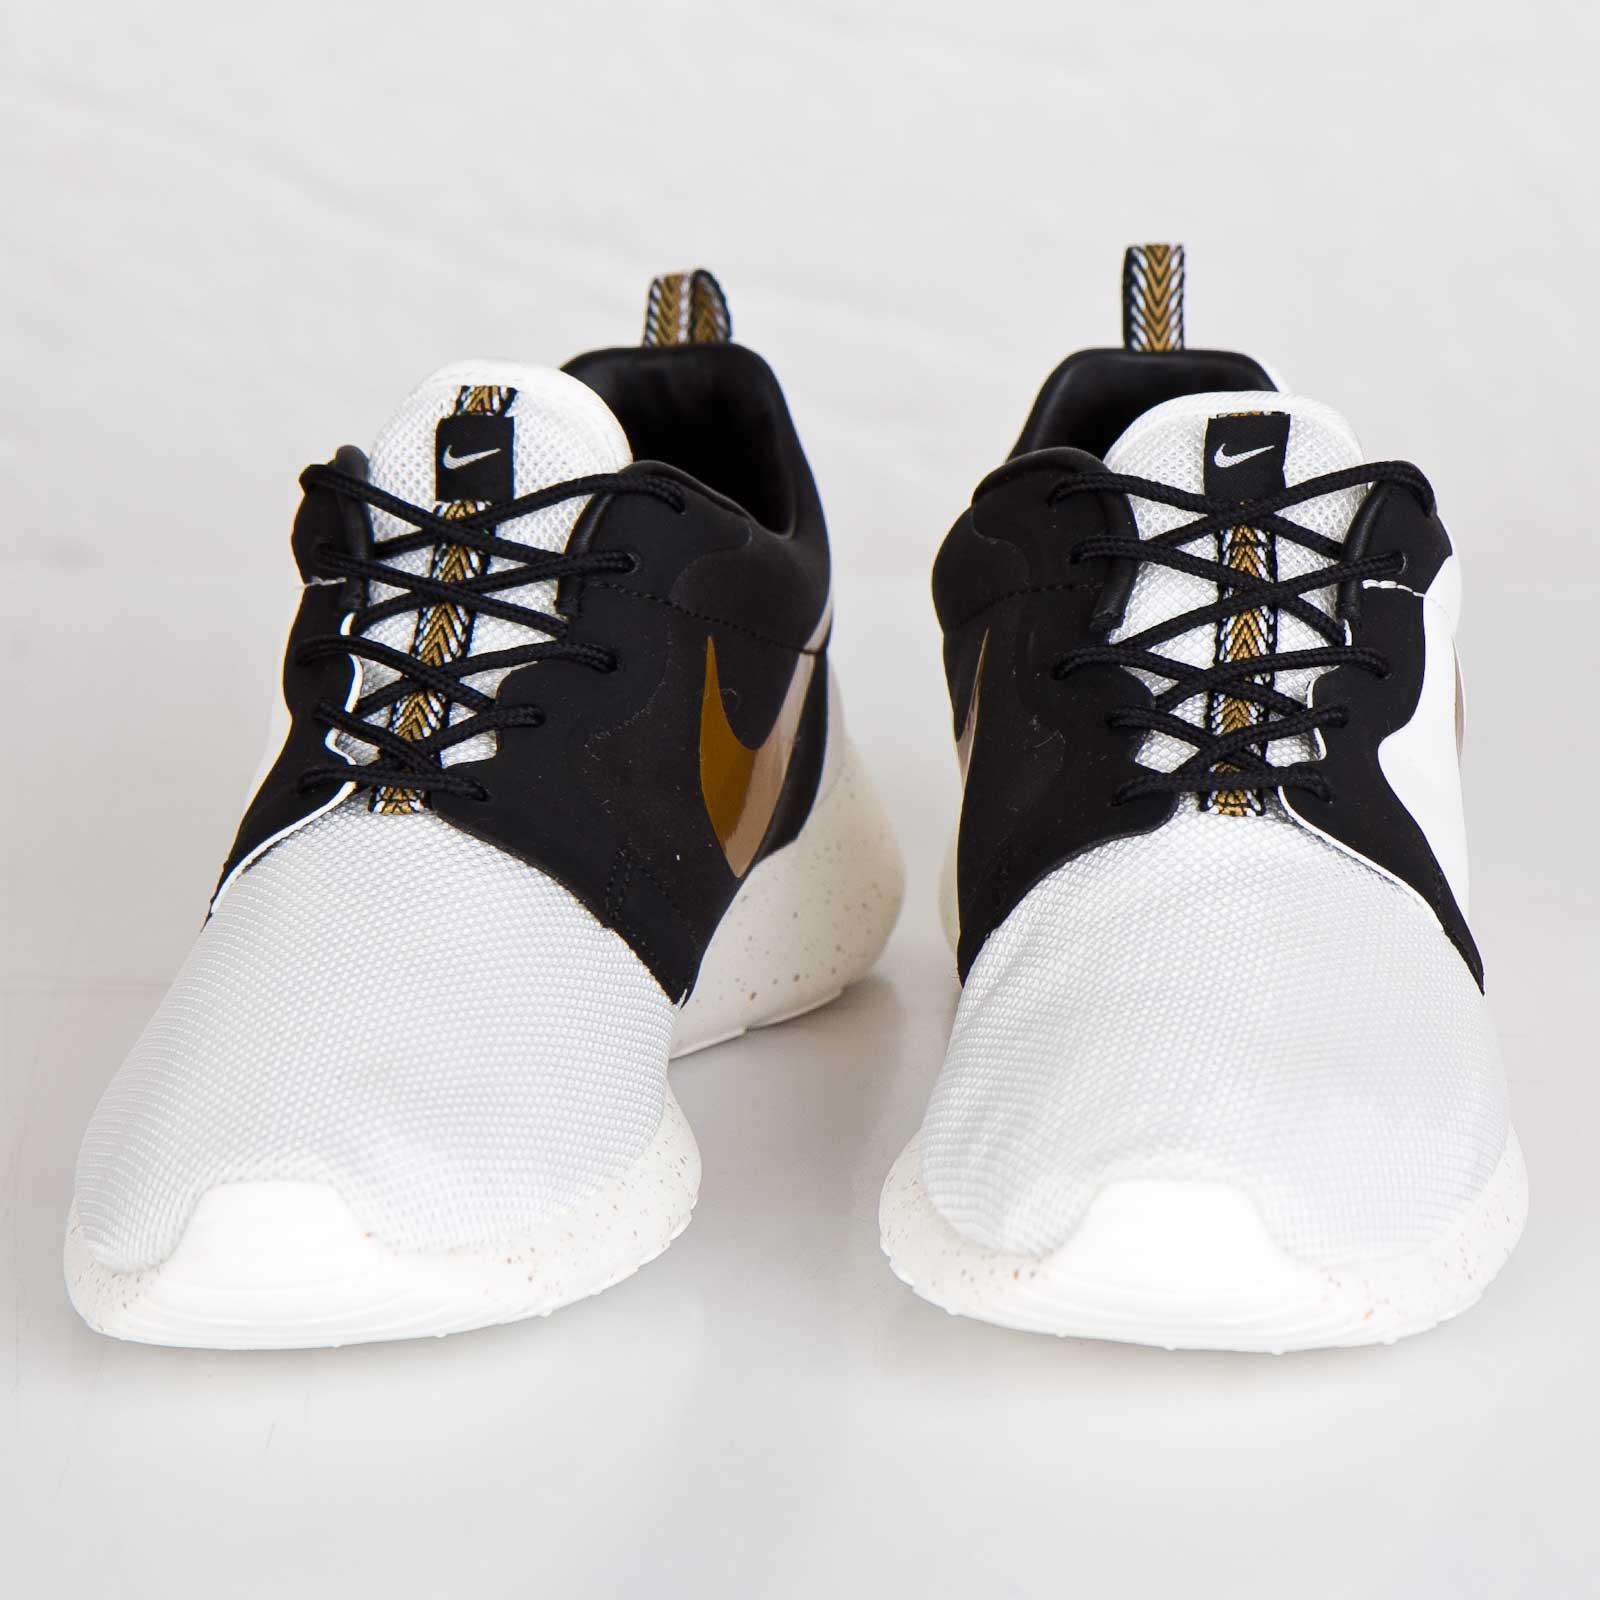 outlet store 12696 2ddd8 Nike Roshe Run Hyperfuse Premium QS - 669689-100 - Sneakersnstuff    sneakers   streetwear online since 1999